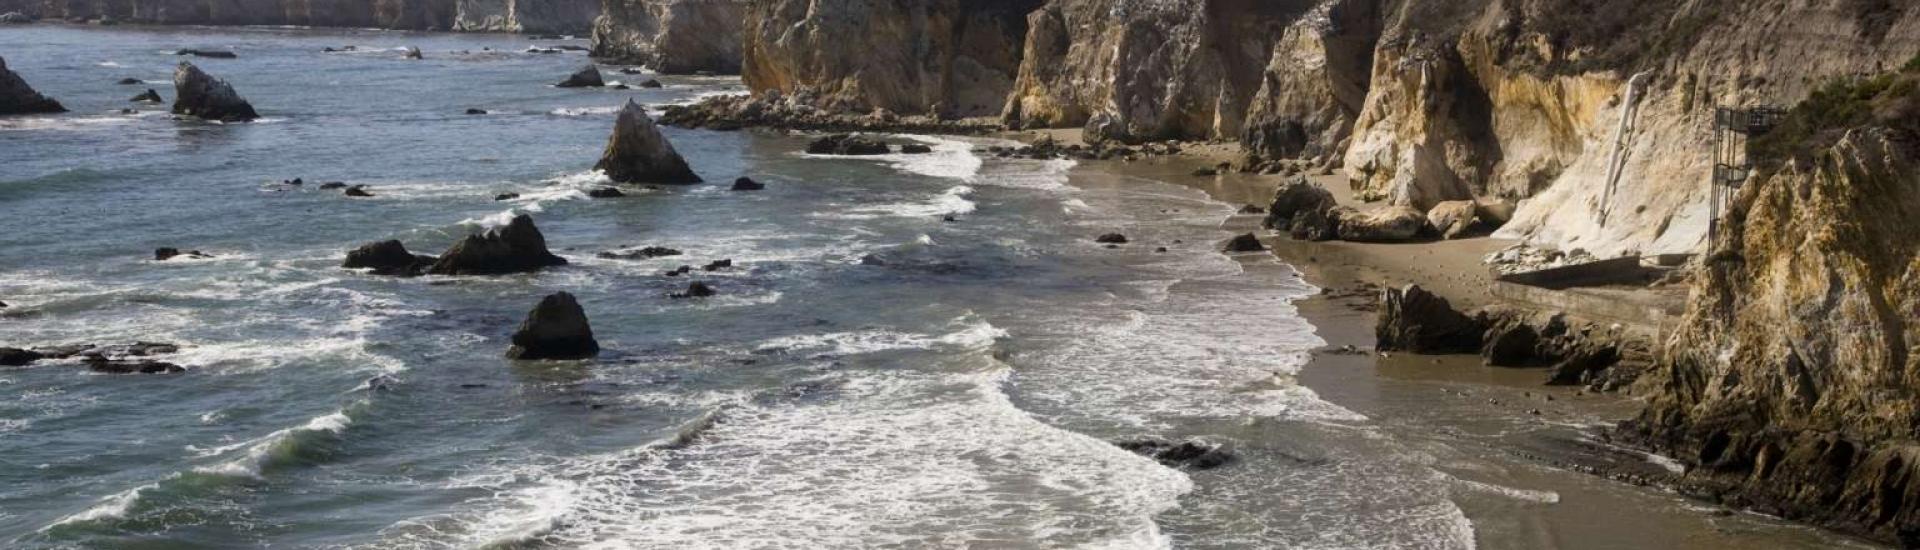 California-rocky-coast-95879504_4368x2912